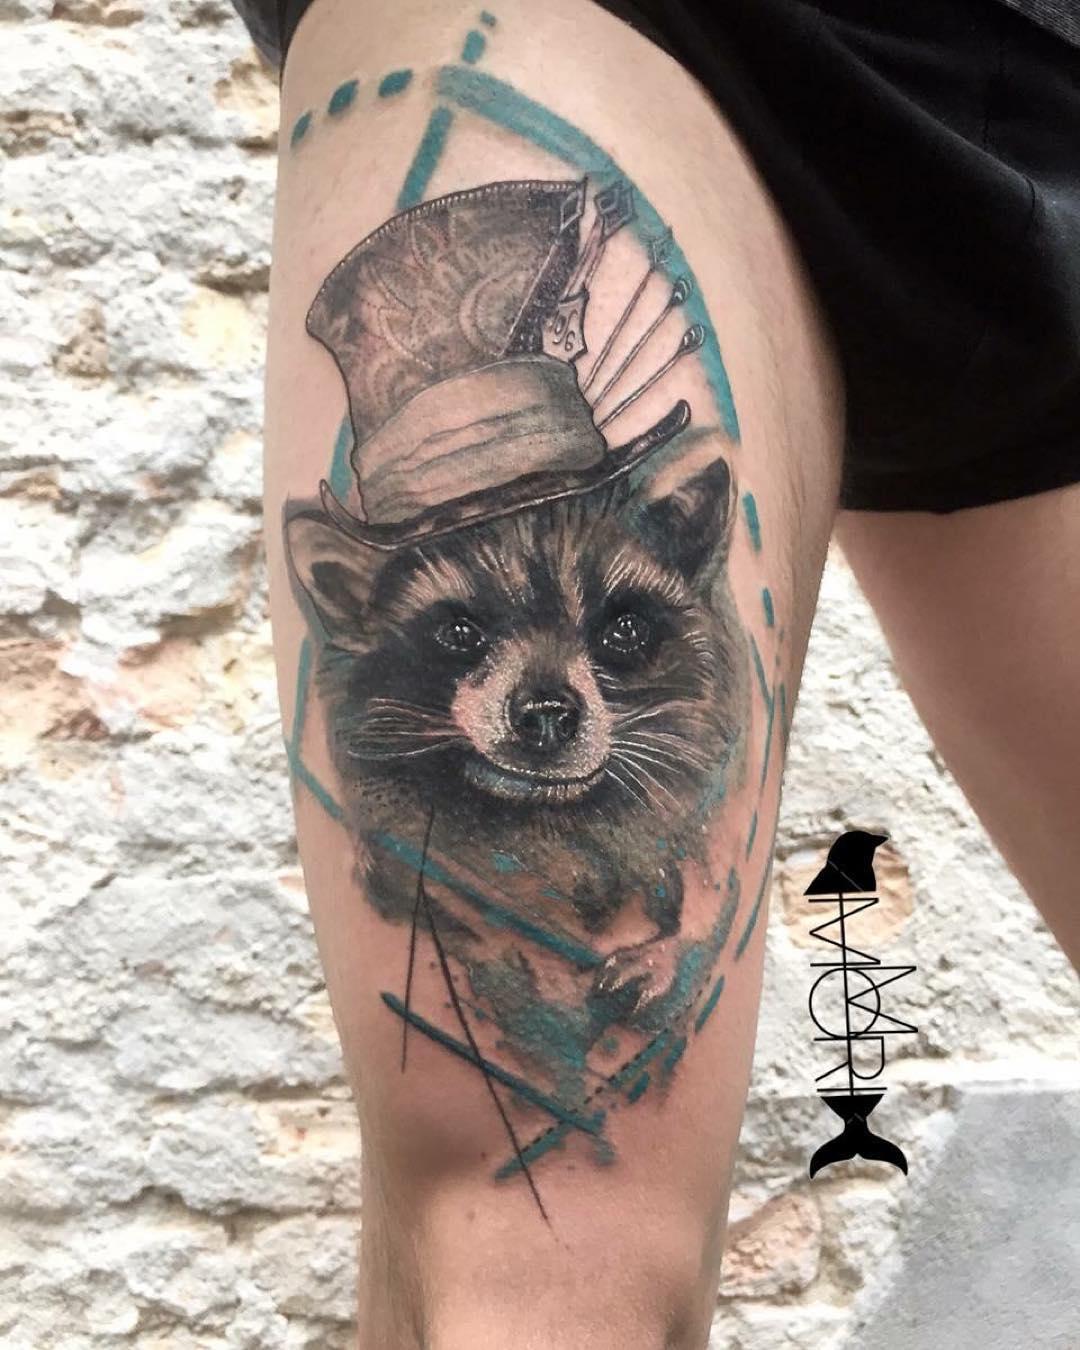 Thigh Raccoon Tattoo